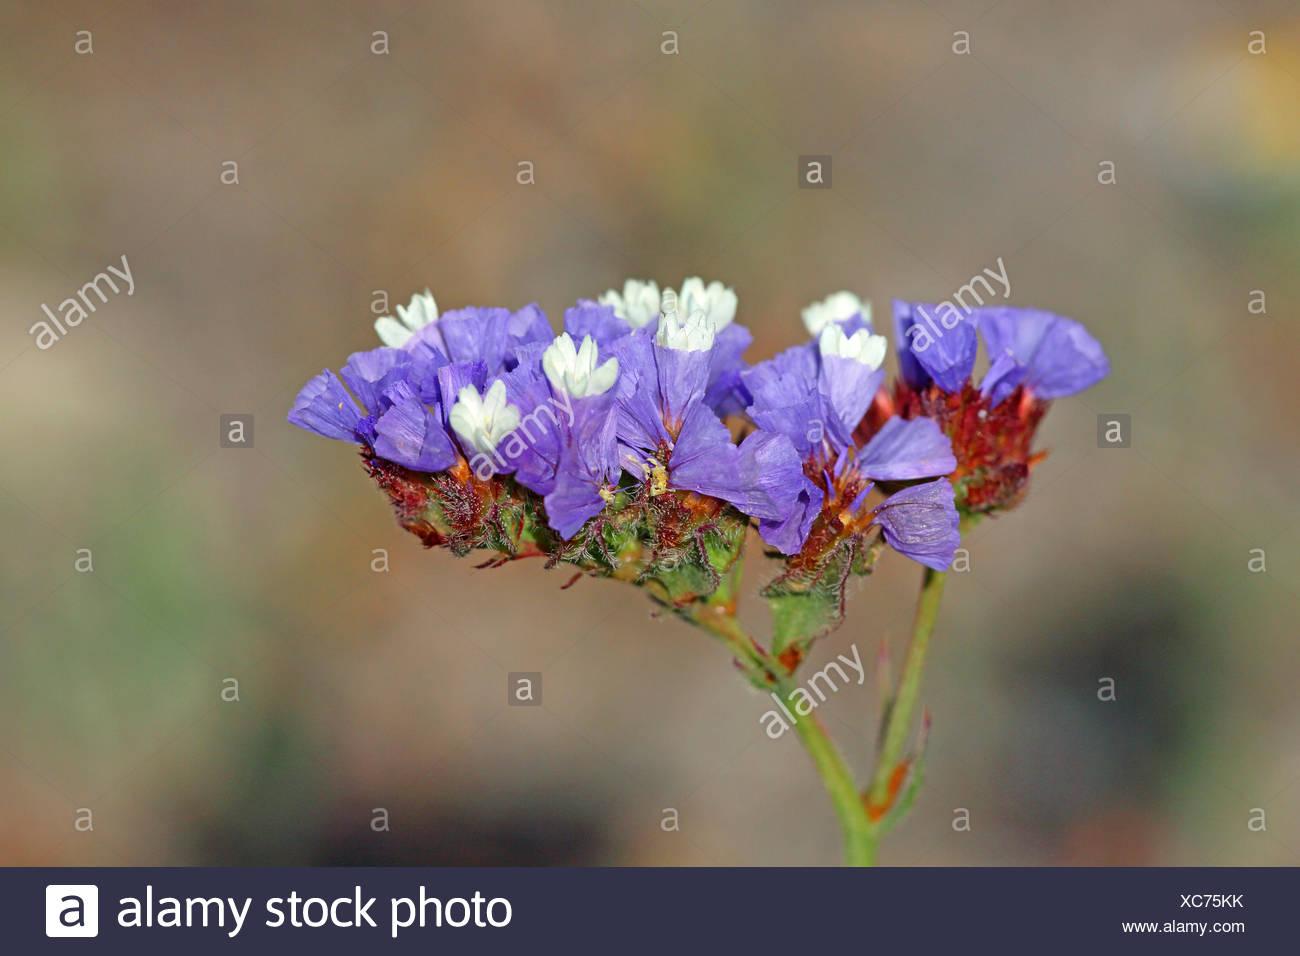 sinuata statice, perennial sea-lavender, winged sea-lavender, wavyleaf sea-lavender (Limonium sinuatum), blossom, Greece, Lesbos - Stock Image